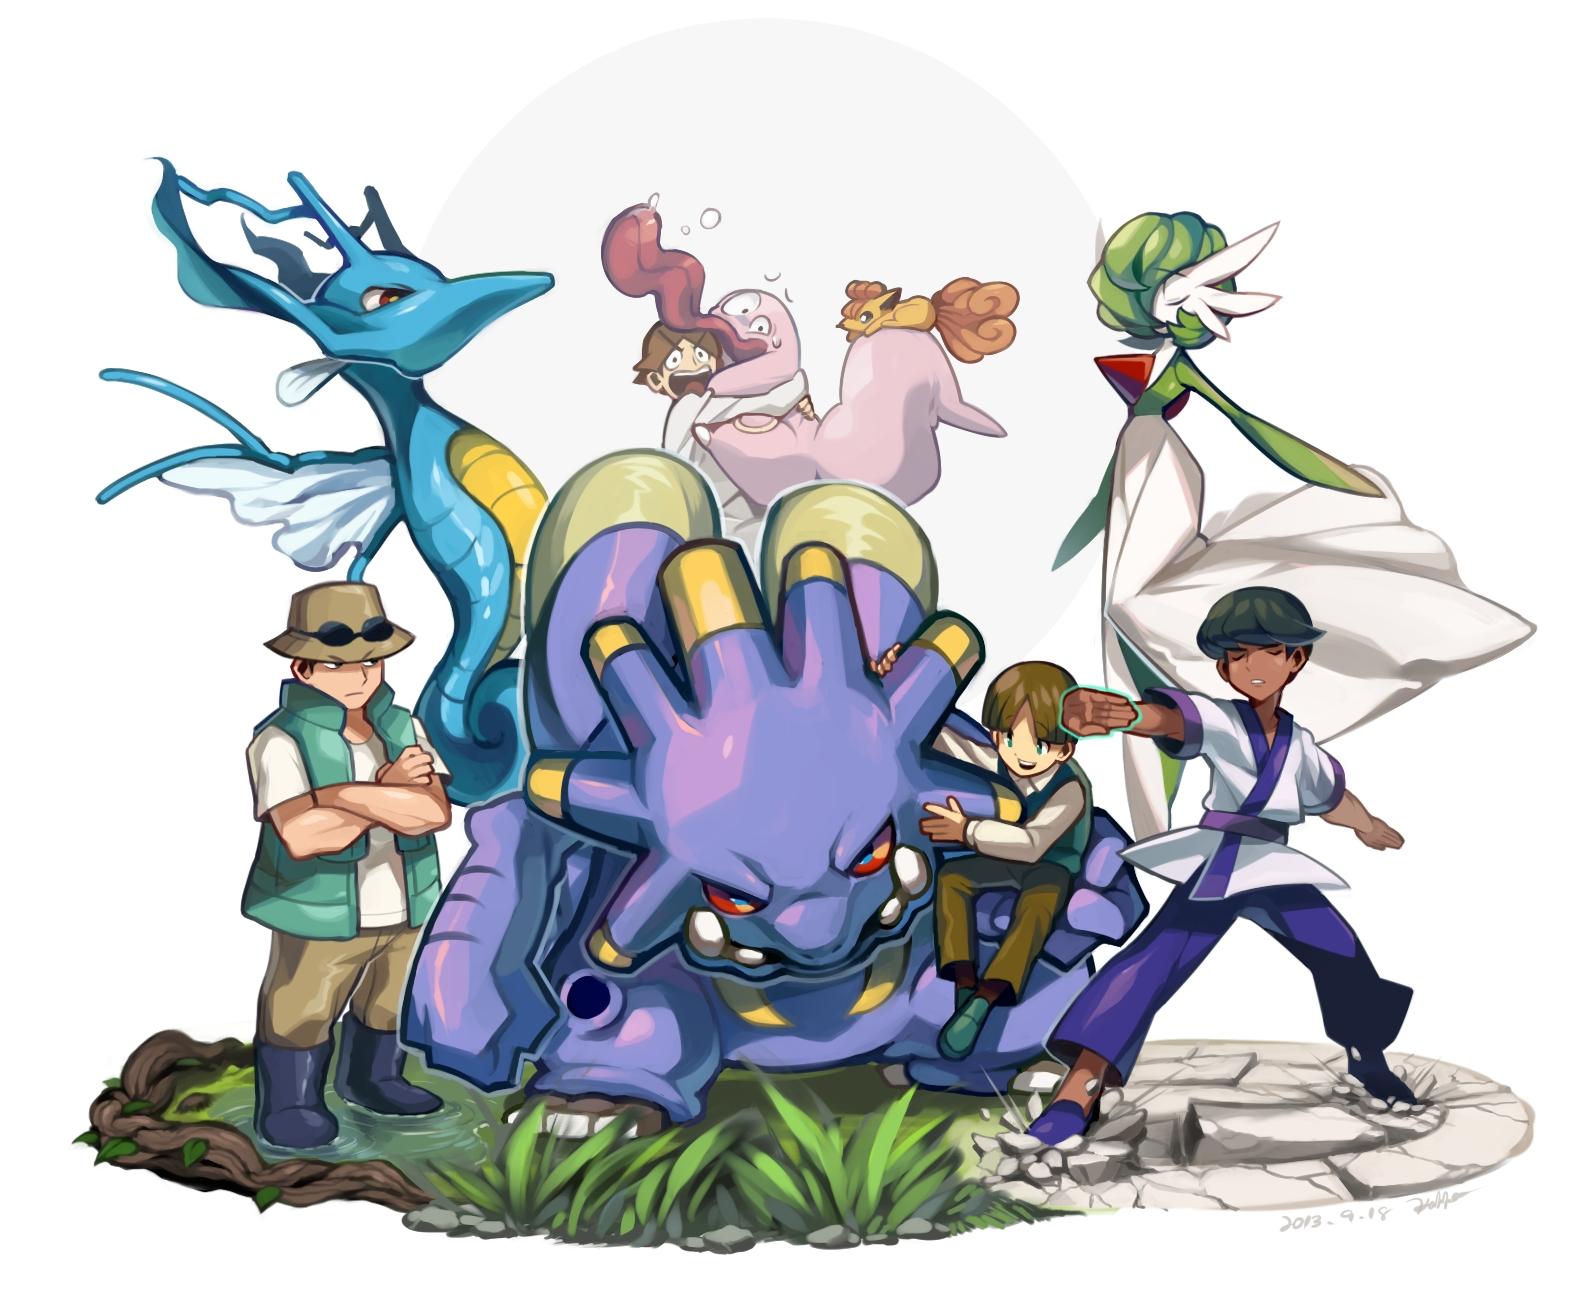 Uncategorized Psychic Pokemon psychic zerochan anime image board download image